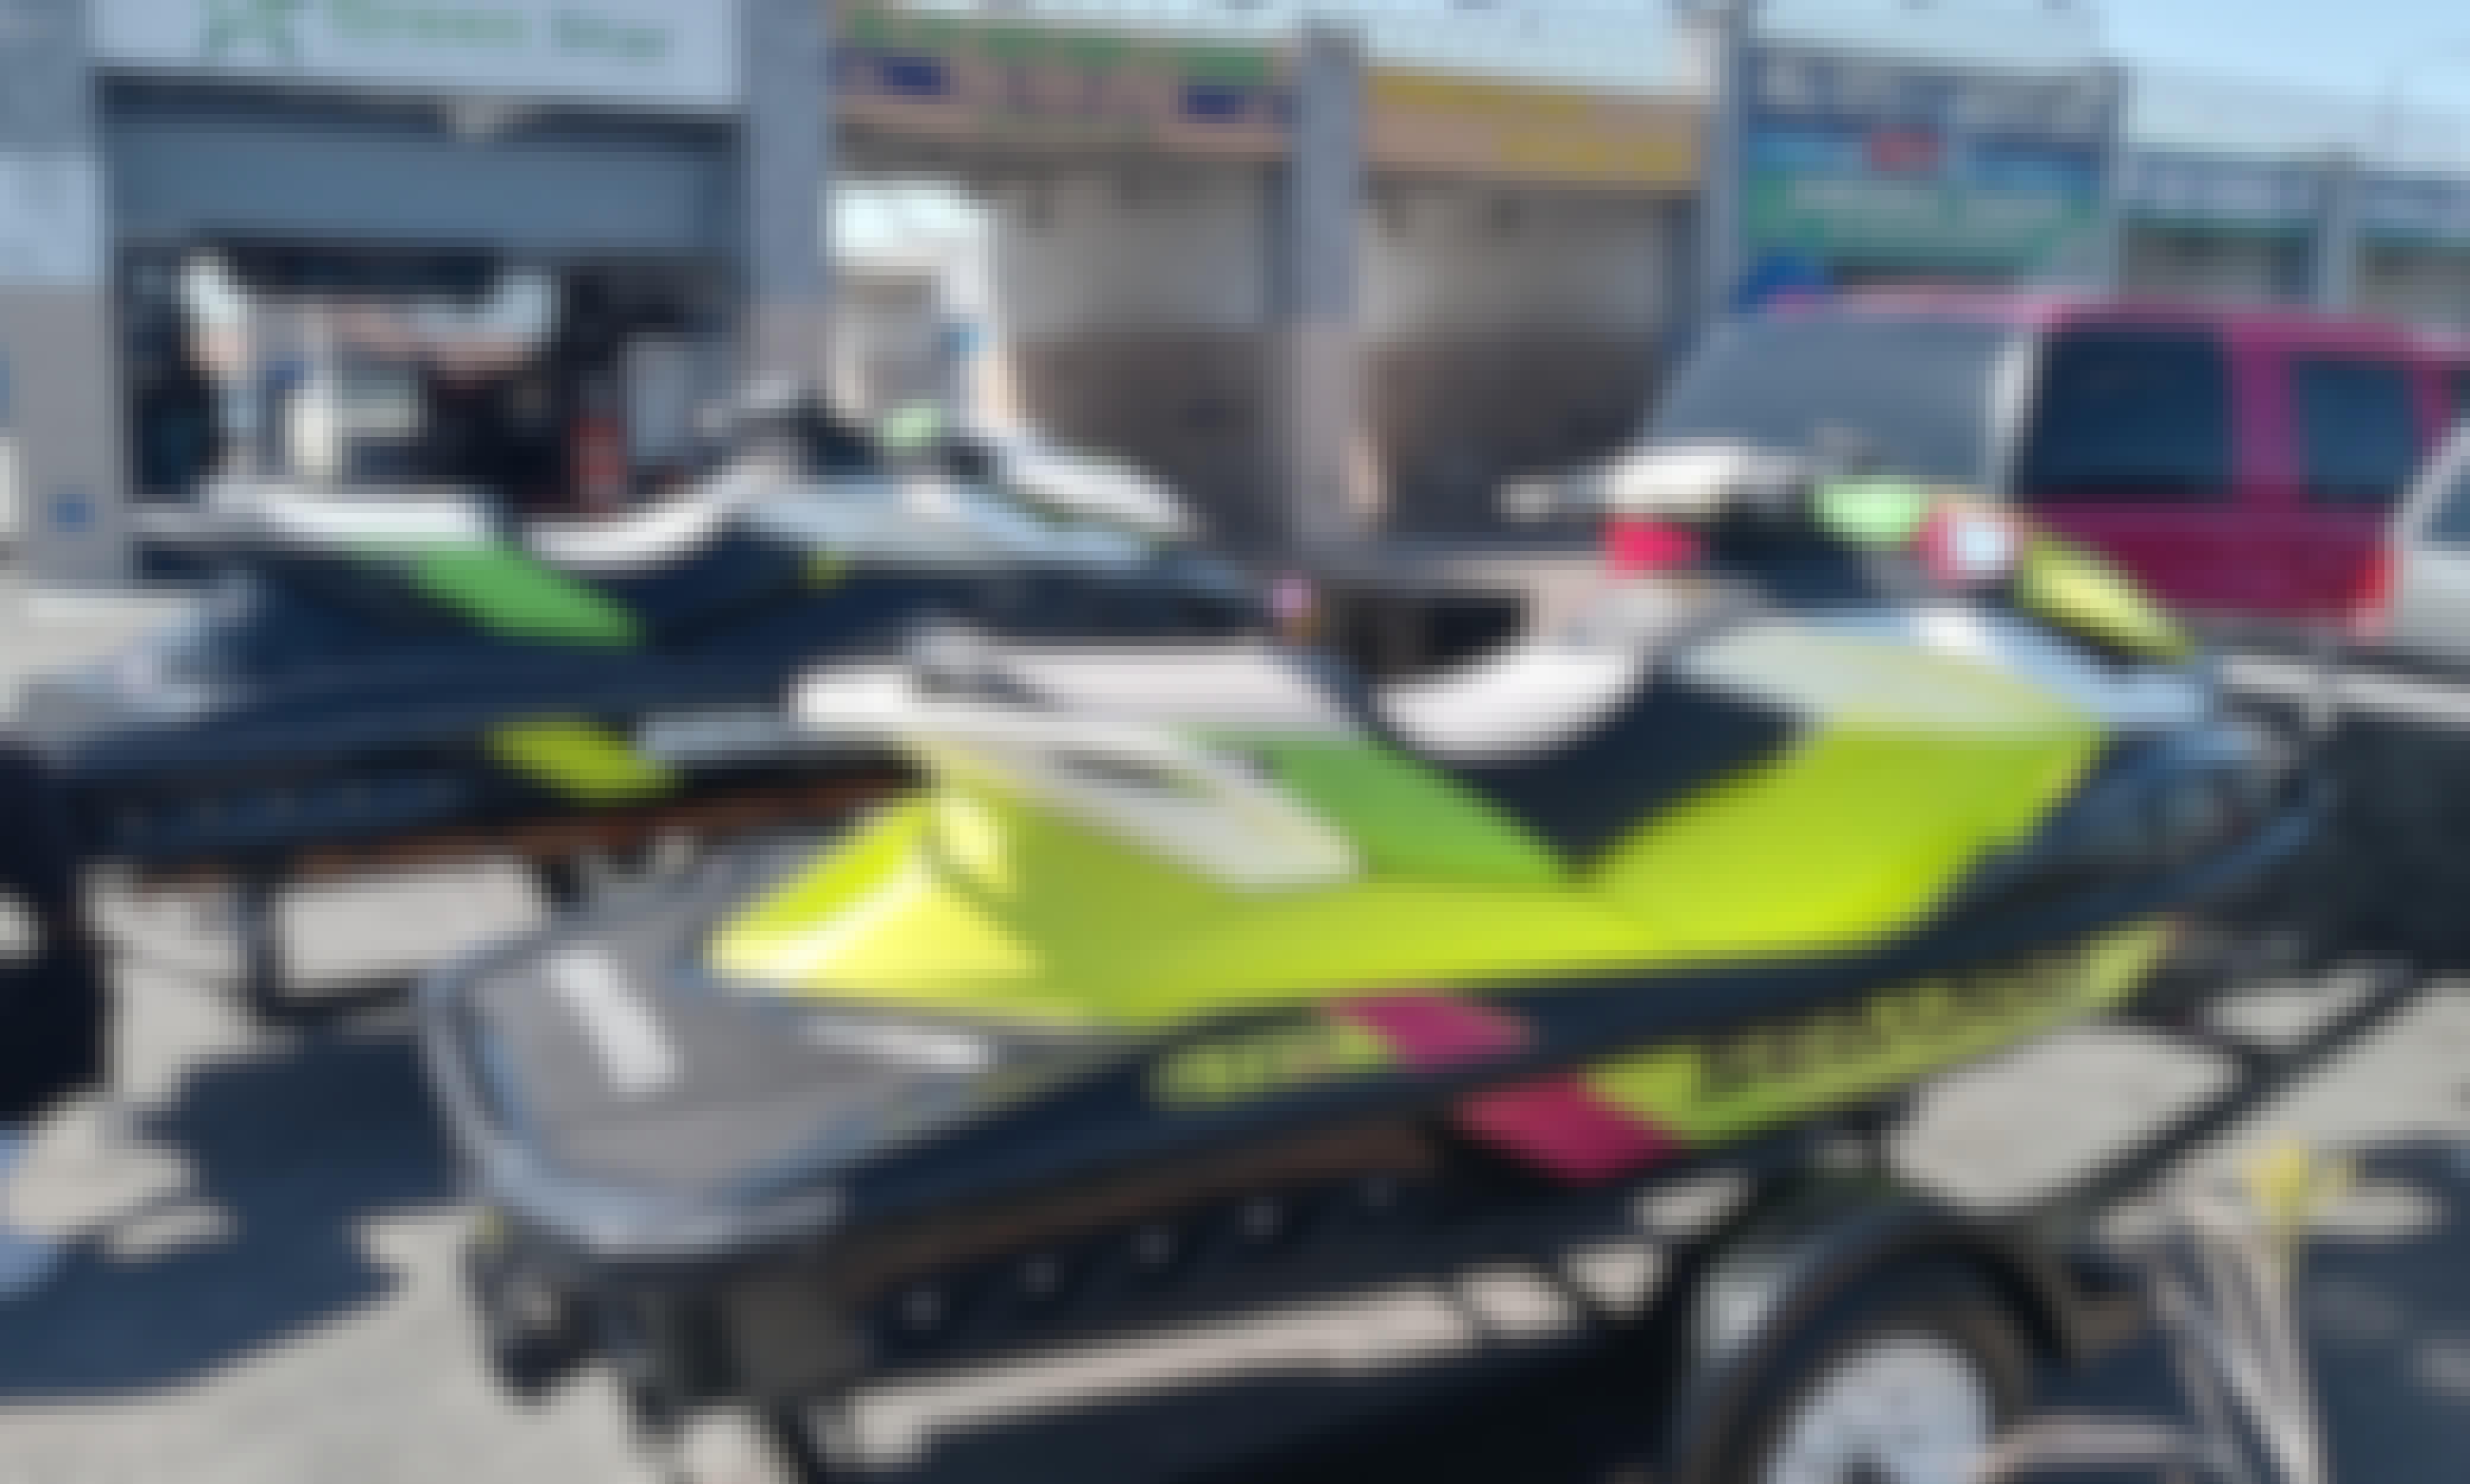 SeaDoo JetSki in Las Vegas